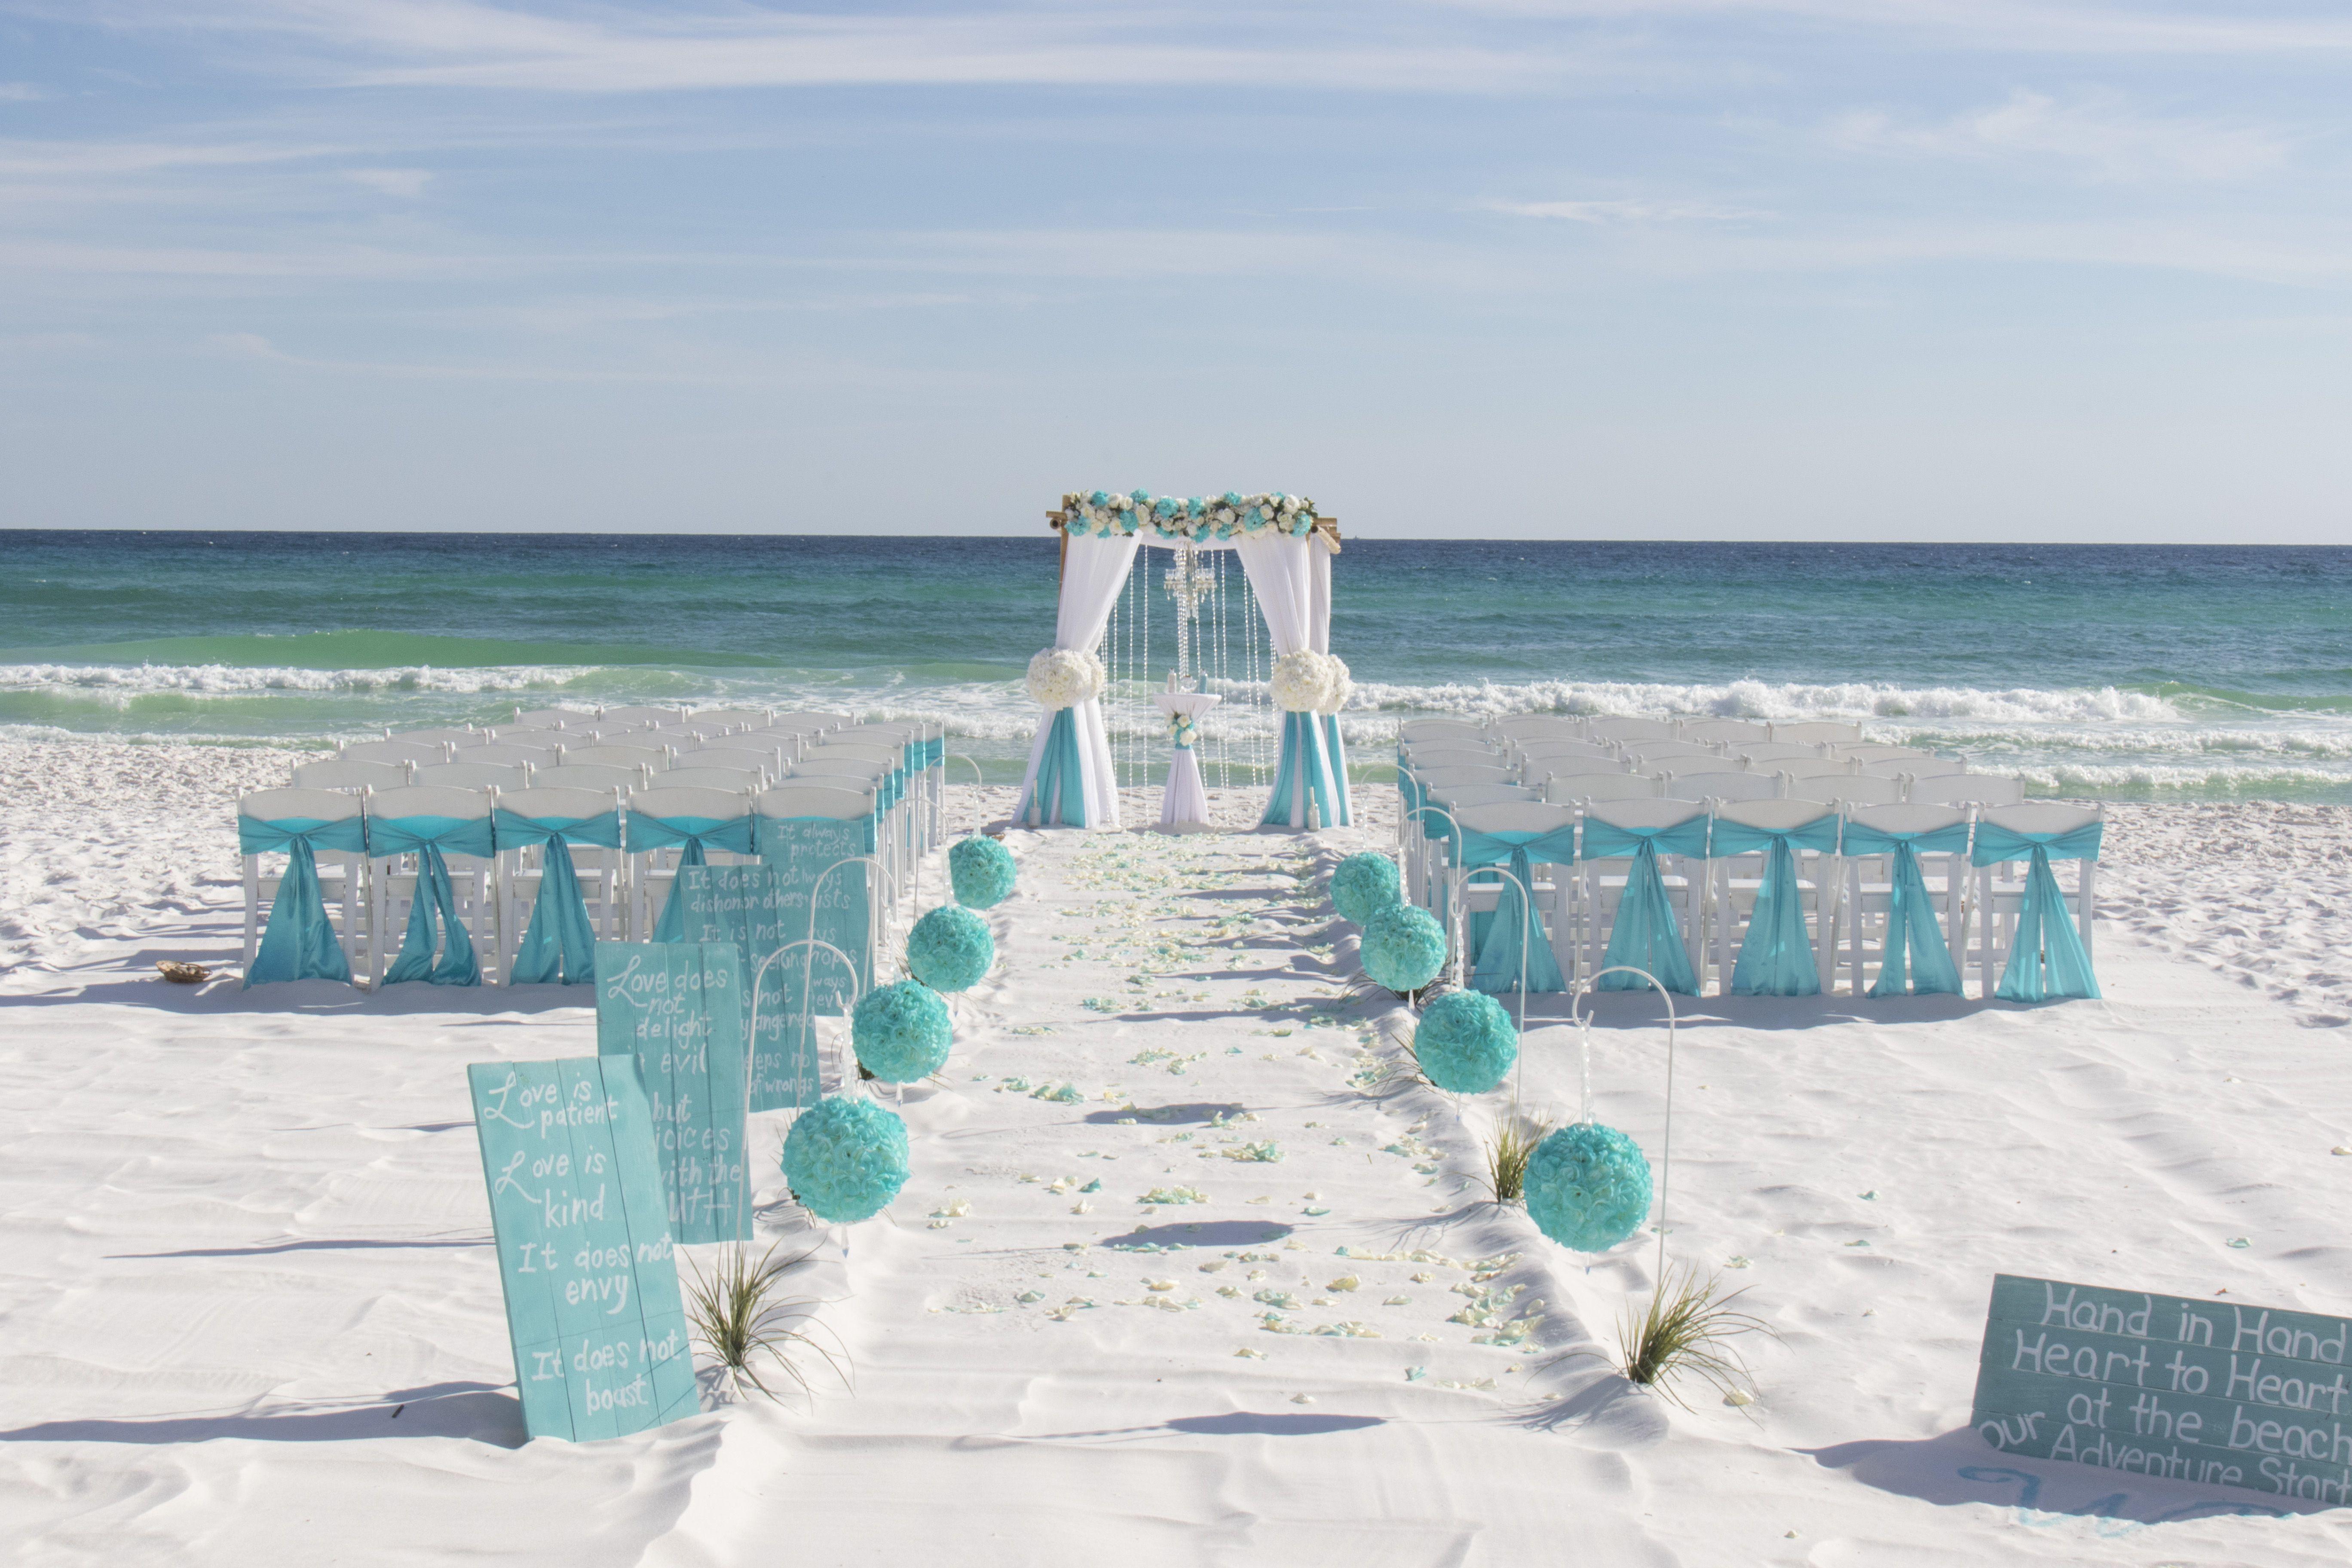 Destin Florida Beach Wedding Package In 2020 With Images Beach Wedding Packages Beach Wedding Arch Wedding Venues Beach